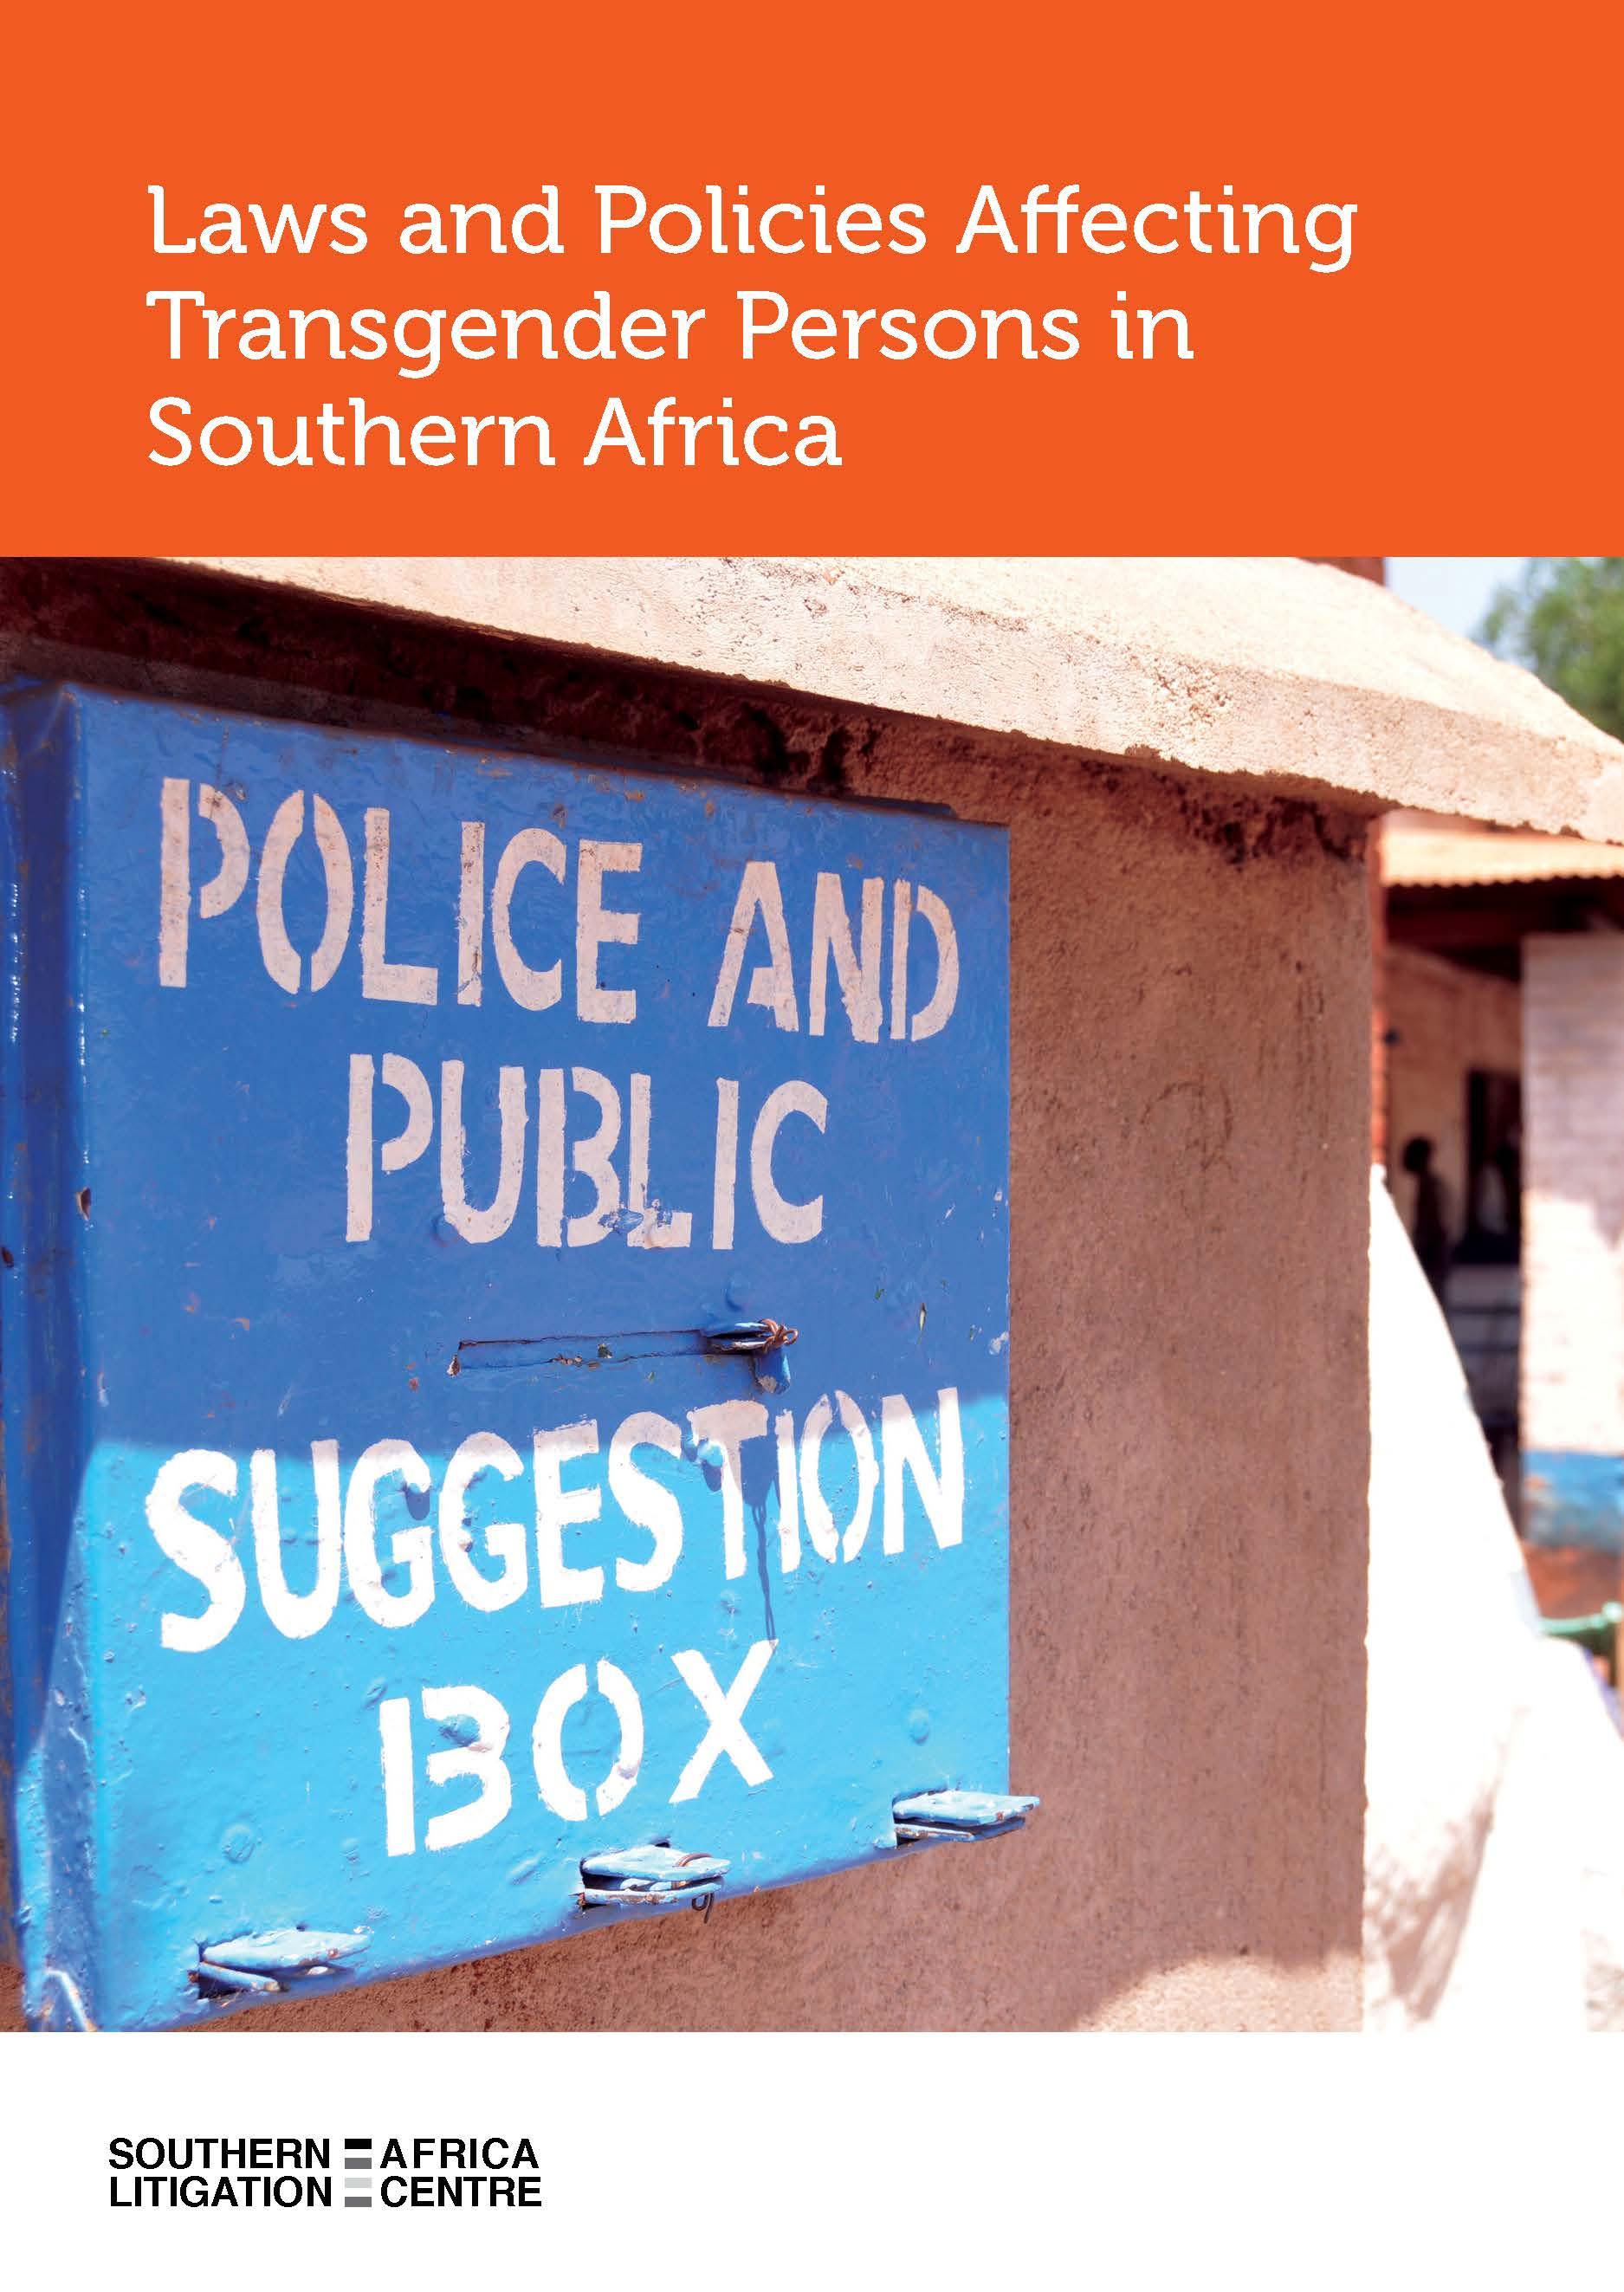 NAMIBIA: STERILISATION CASE GOES TO HIGH COURT